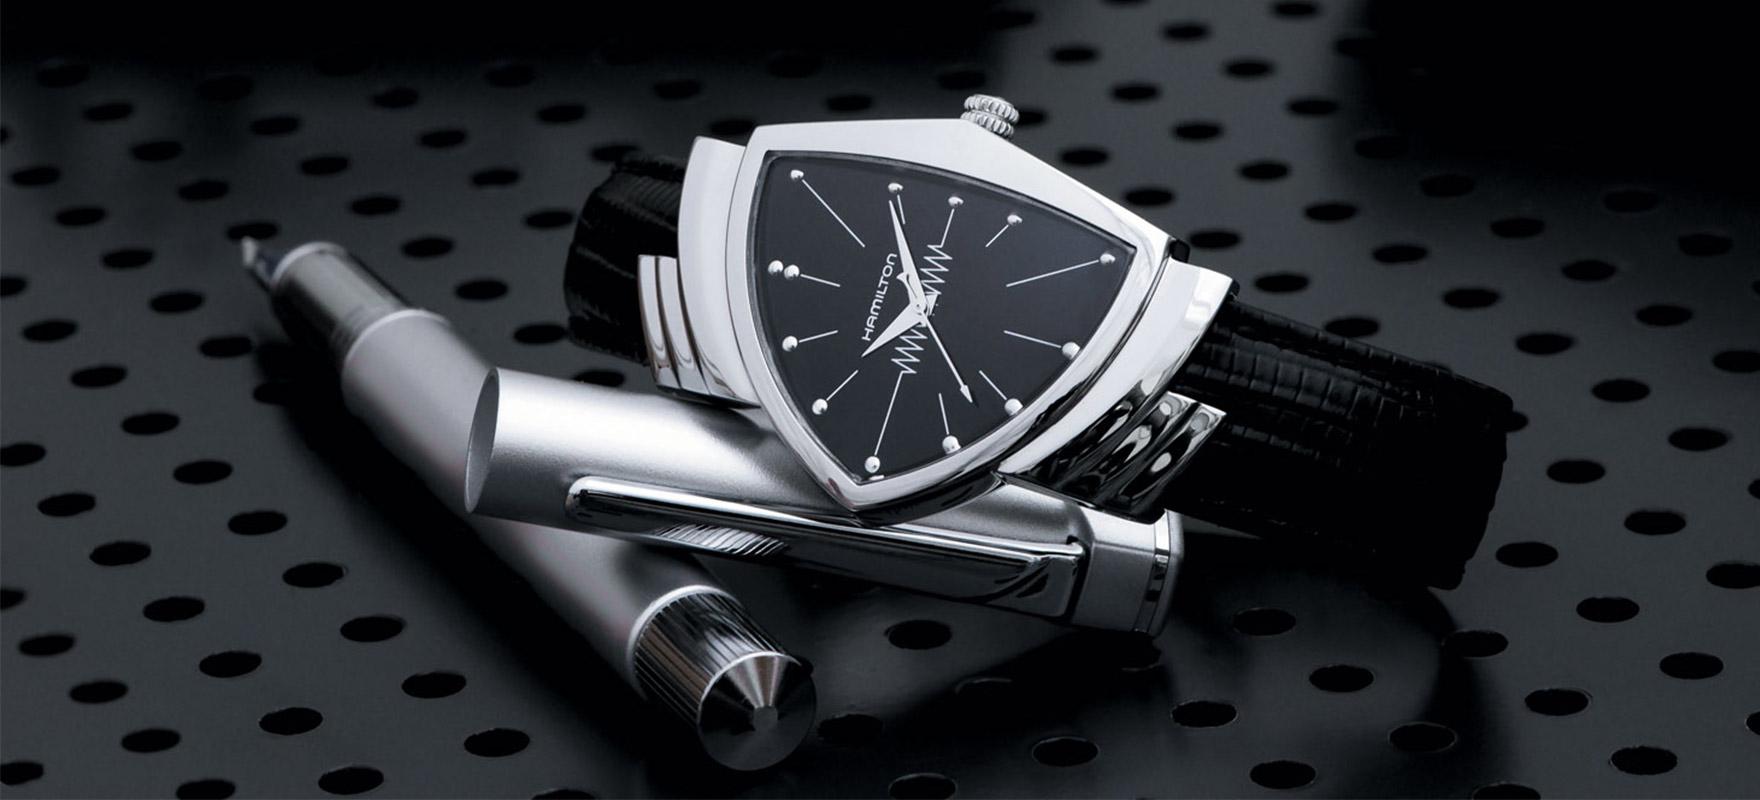 hamilton-watch-men-in-black